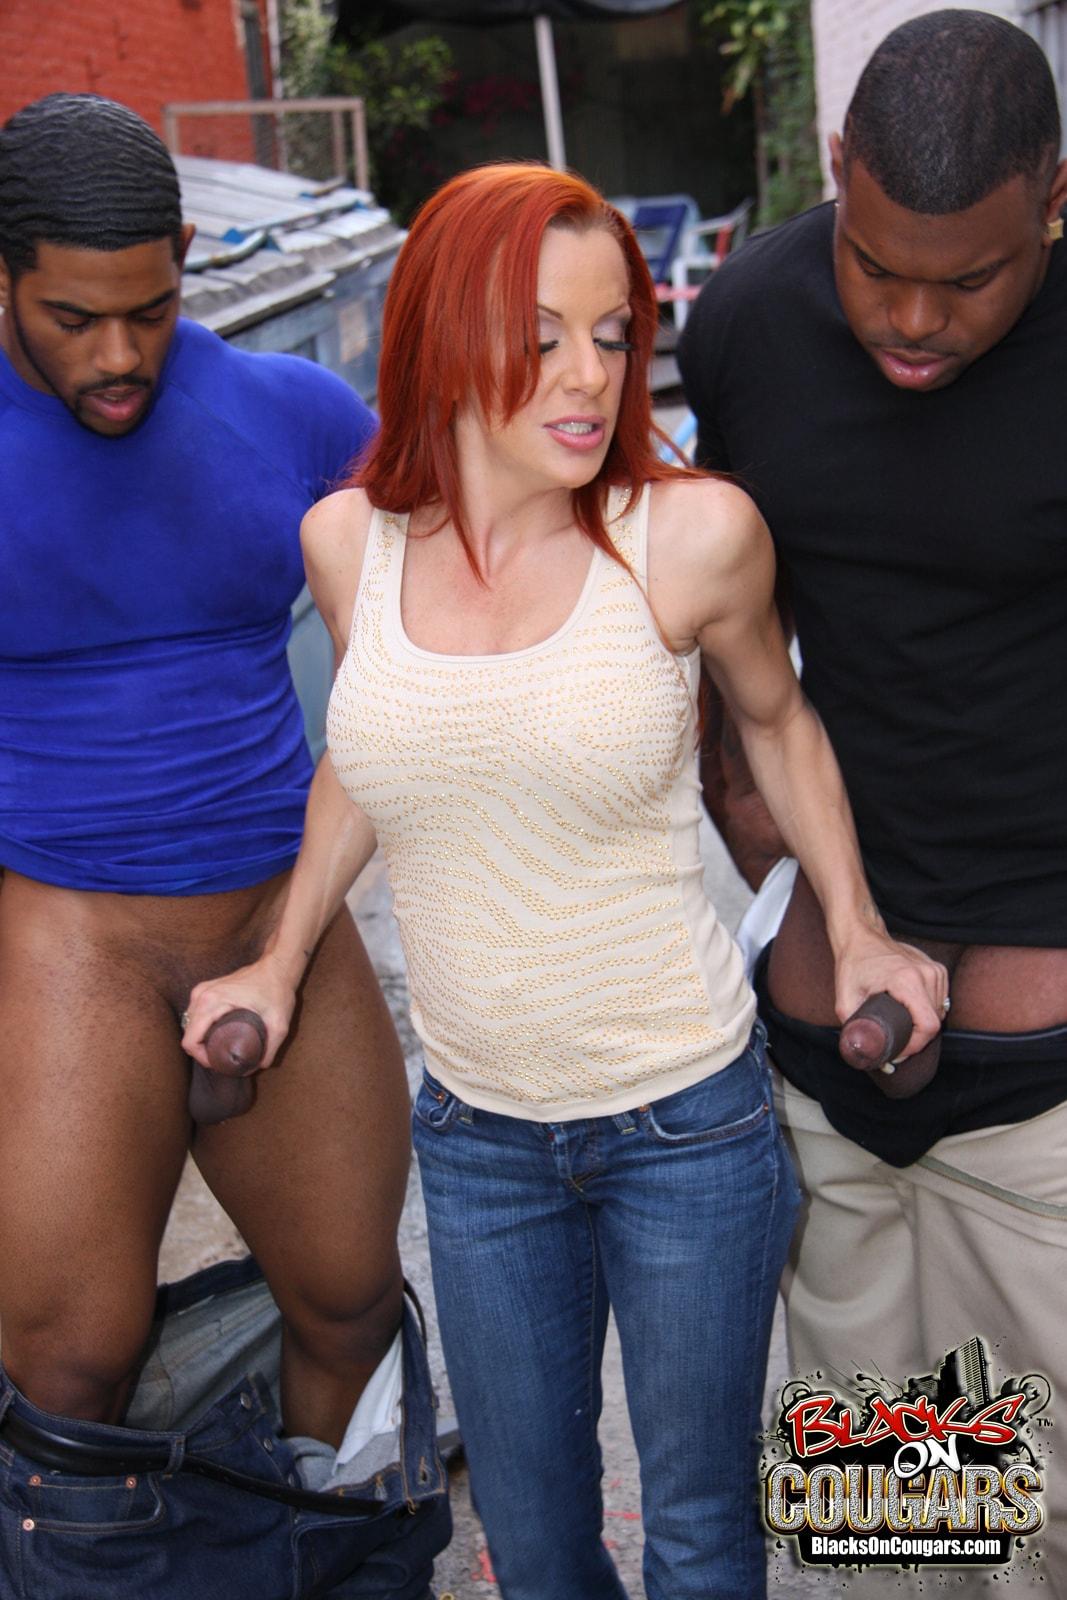 Dogfart '- Blacks On Cougars' starring Shannon Kelly (Photo 15)